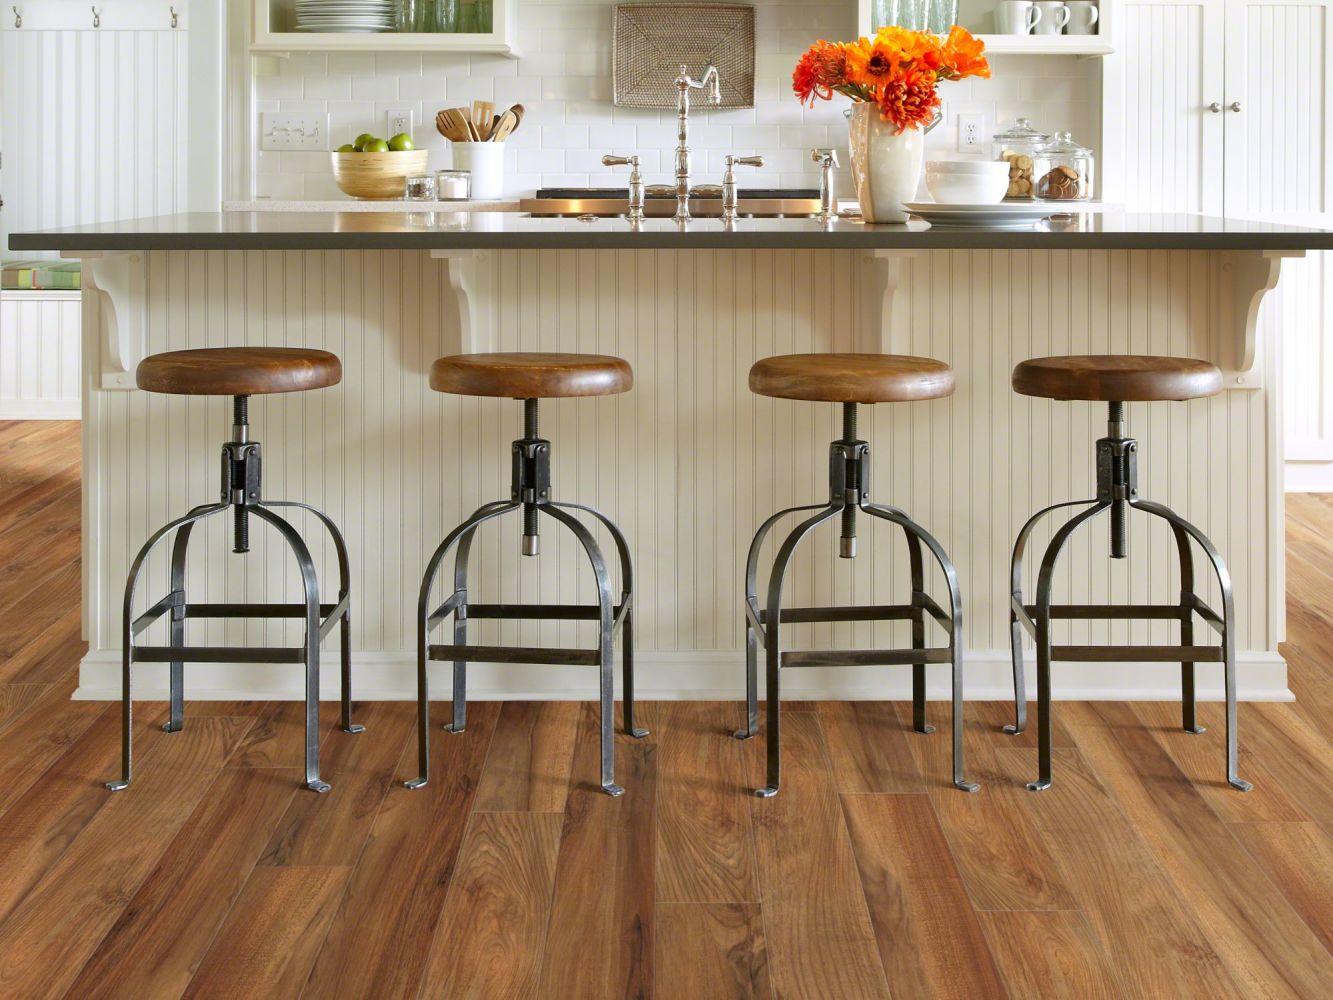 Shaw Floors Resilient Residential Legacy Venna 00820_0457V